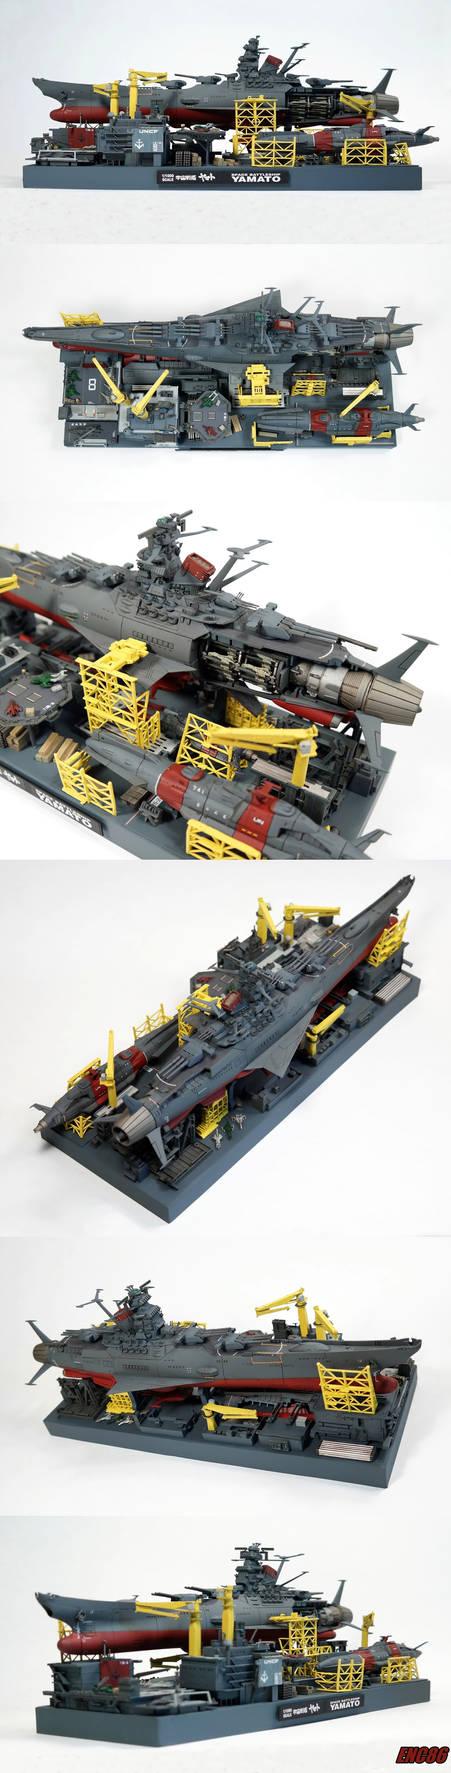 Yamato Dry Dock Collage